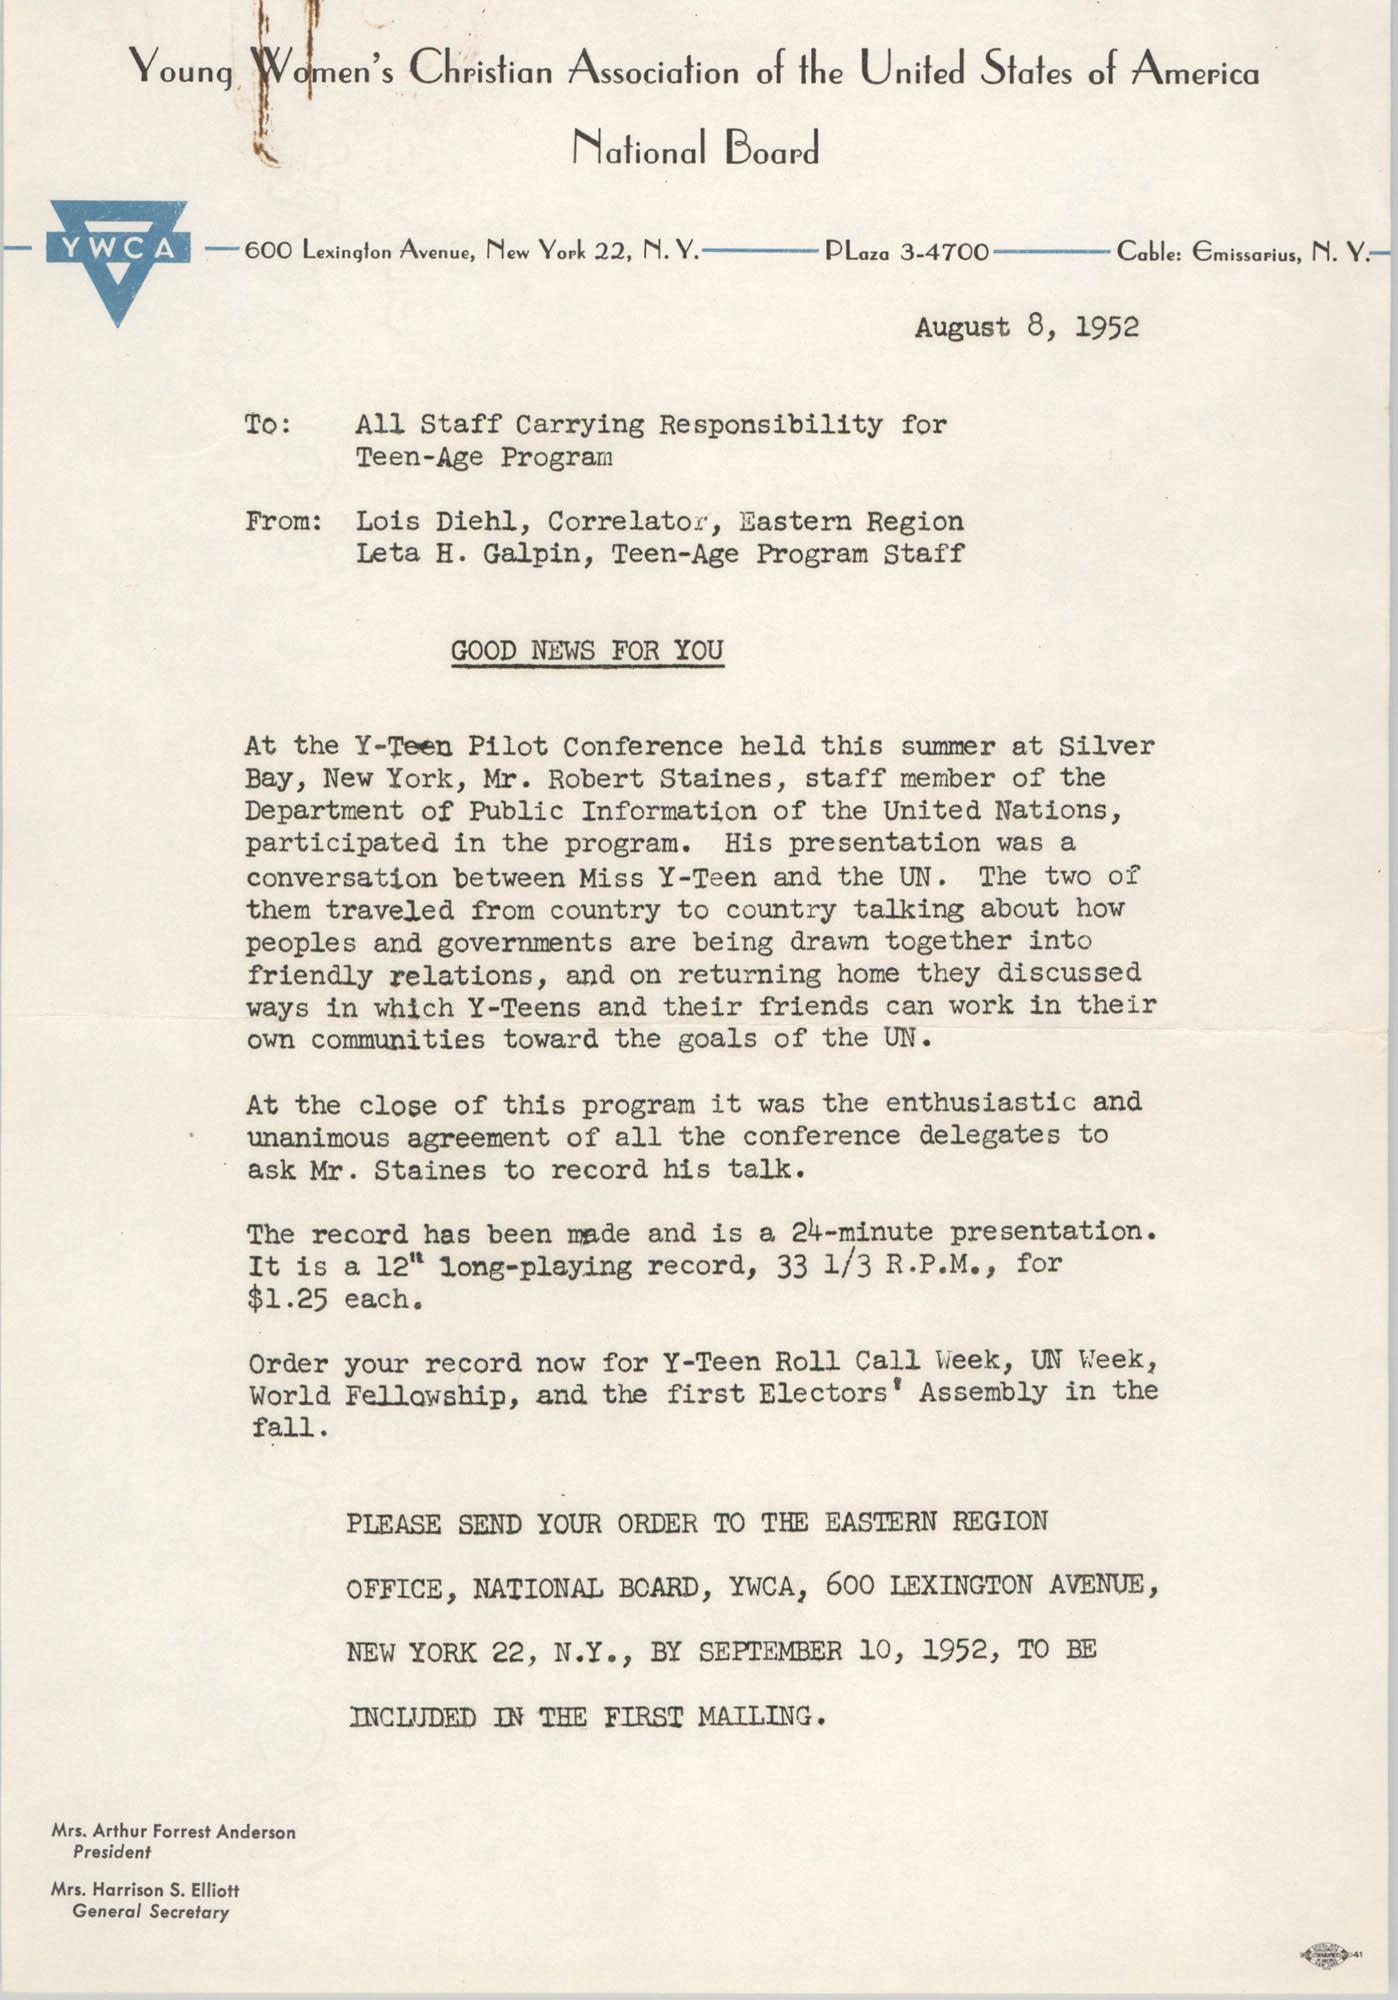 National Board of the Y.W.C.A. Memorandum, August 8, 1952